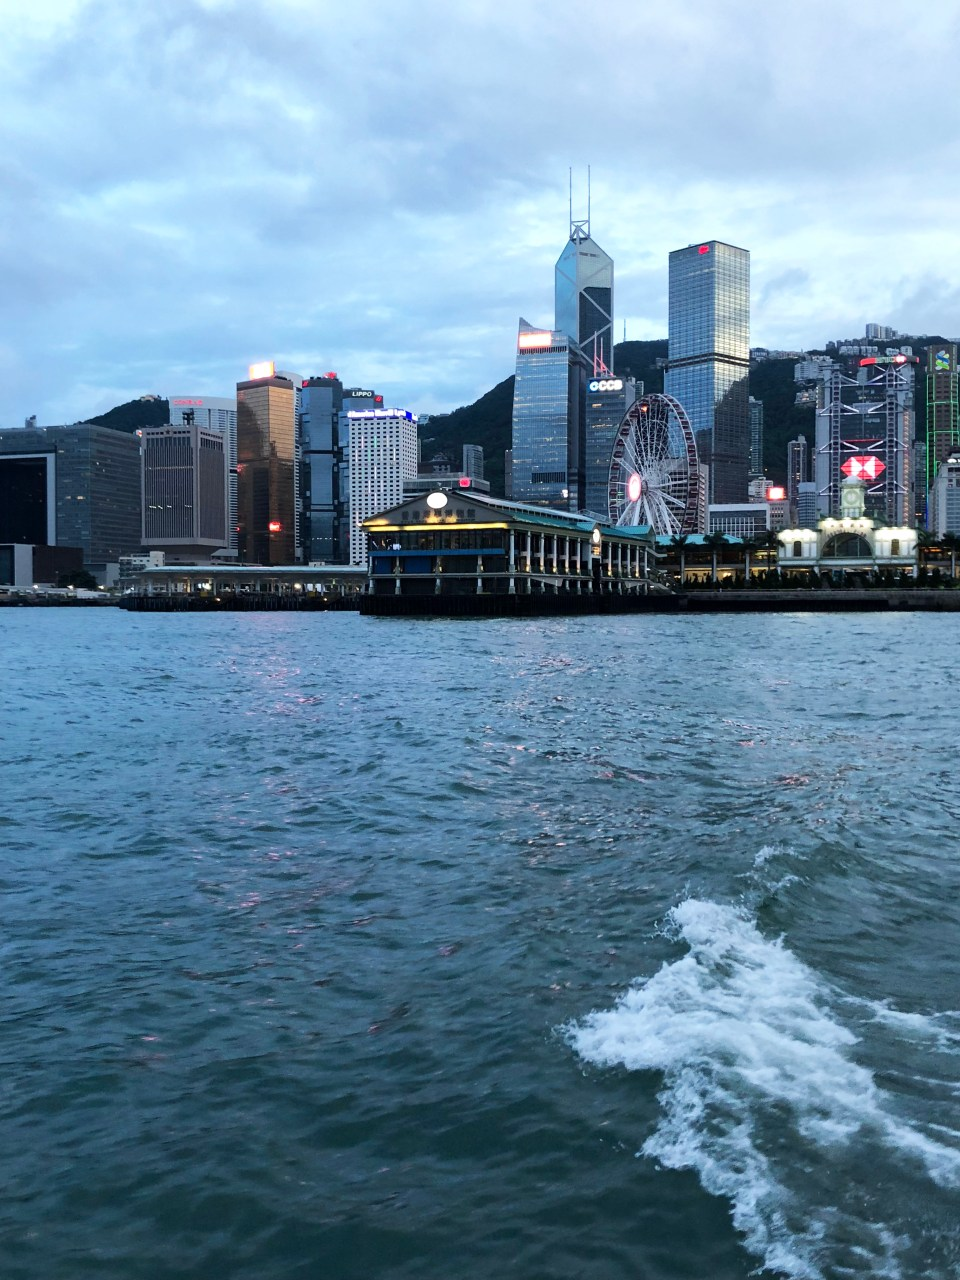 Riding Star Ferry